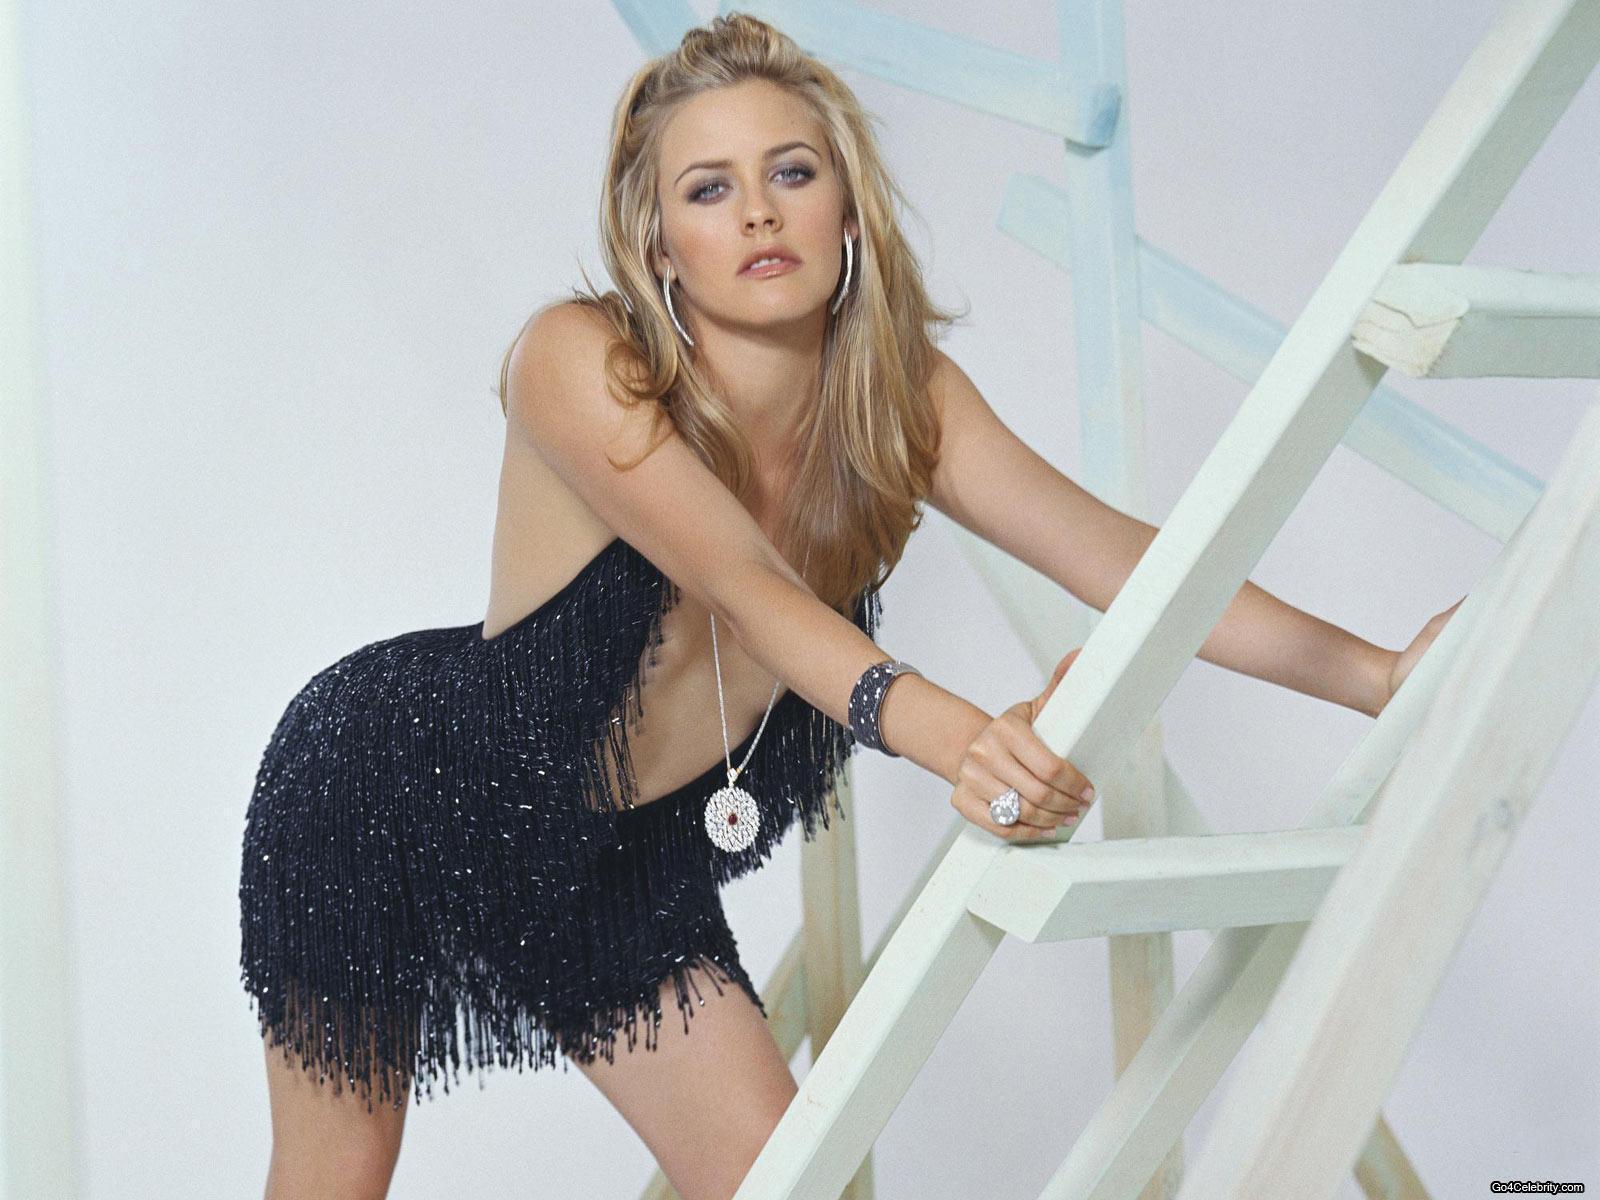 Prekrasna Zenska Stvorenja Alicia-Silverstone-actresses-1447154-1600-1200